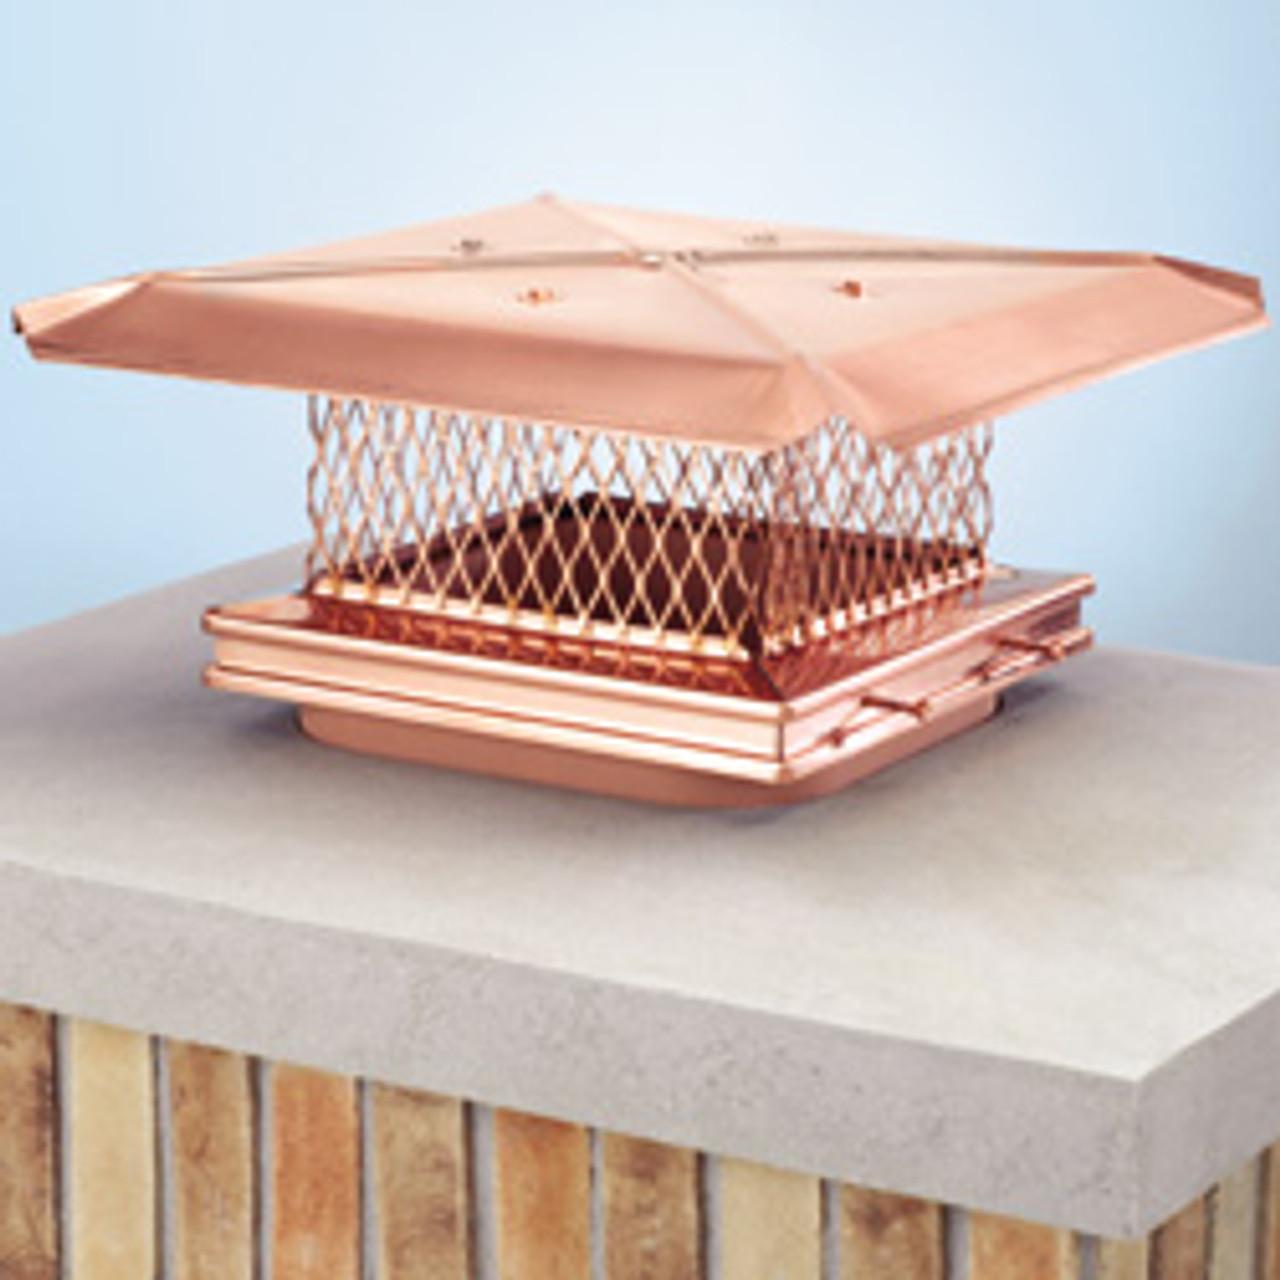 Gelco copper chimney cap